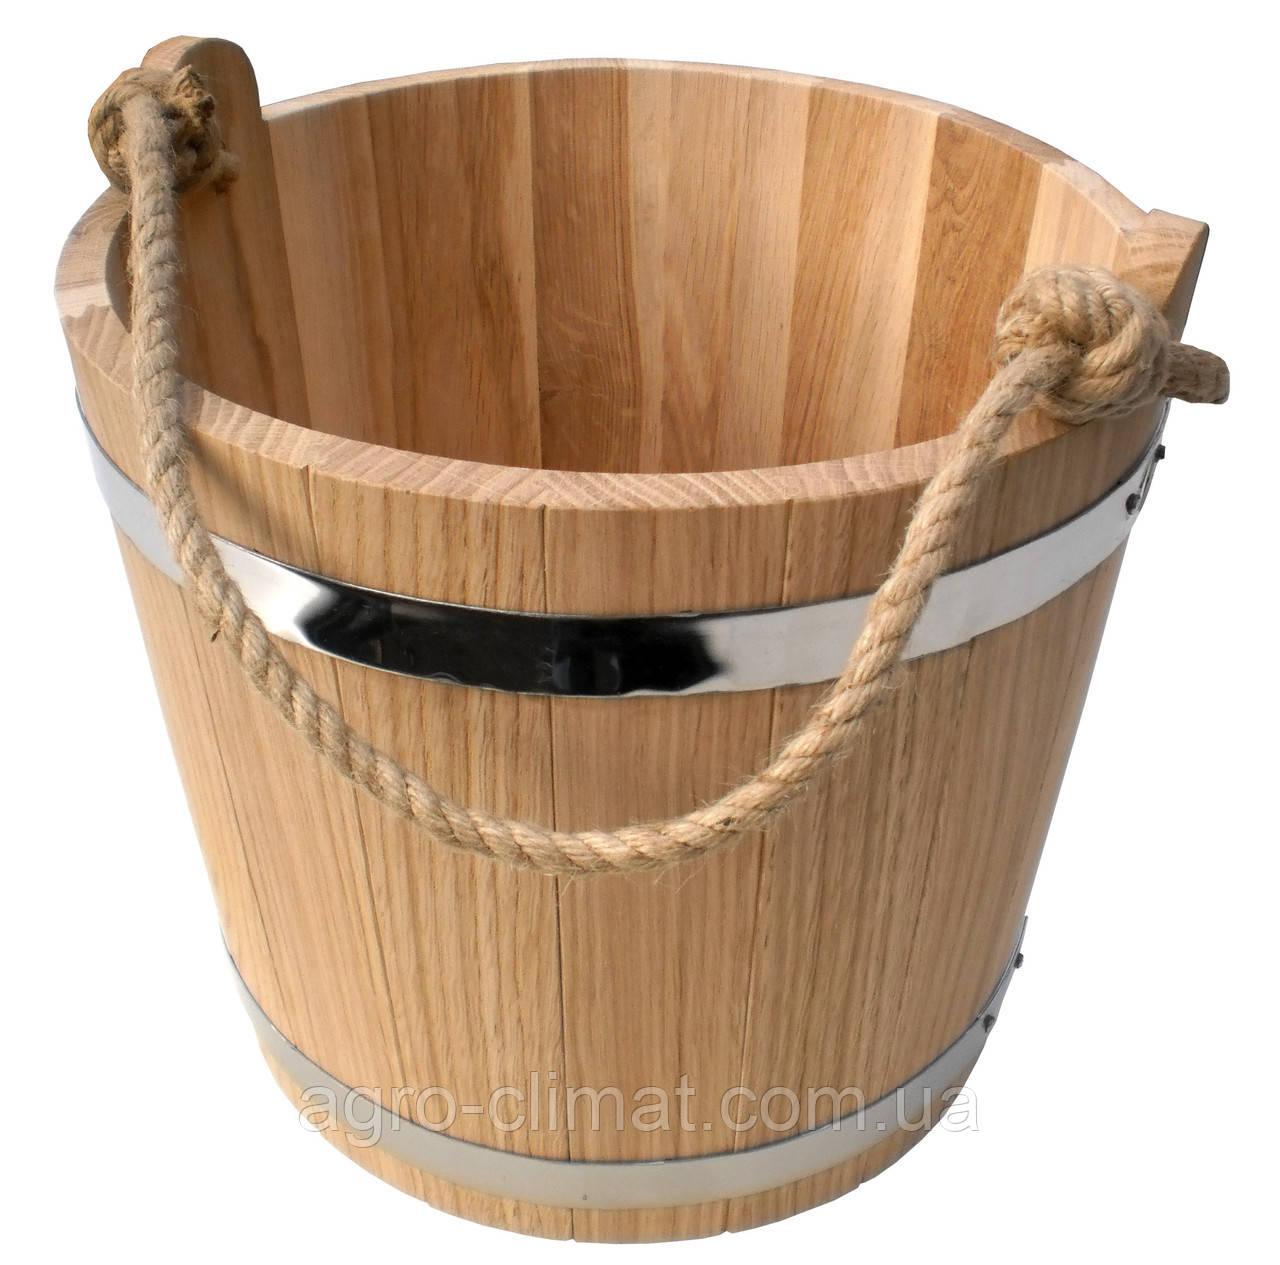 Ведро для бани 15 л. (эконом)